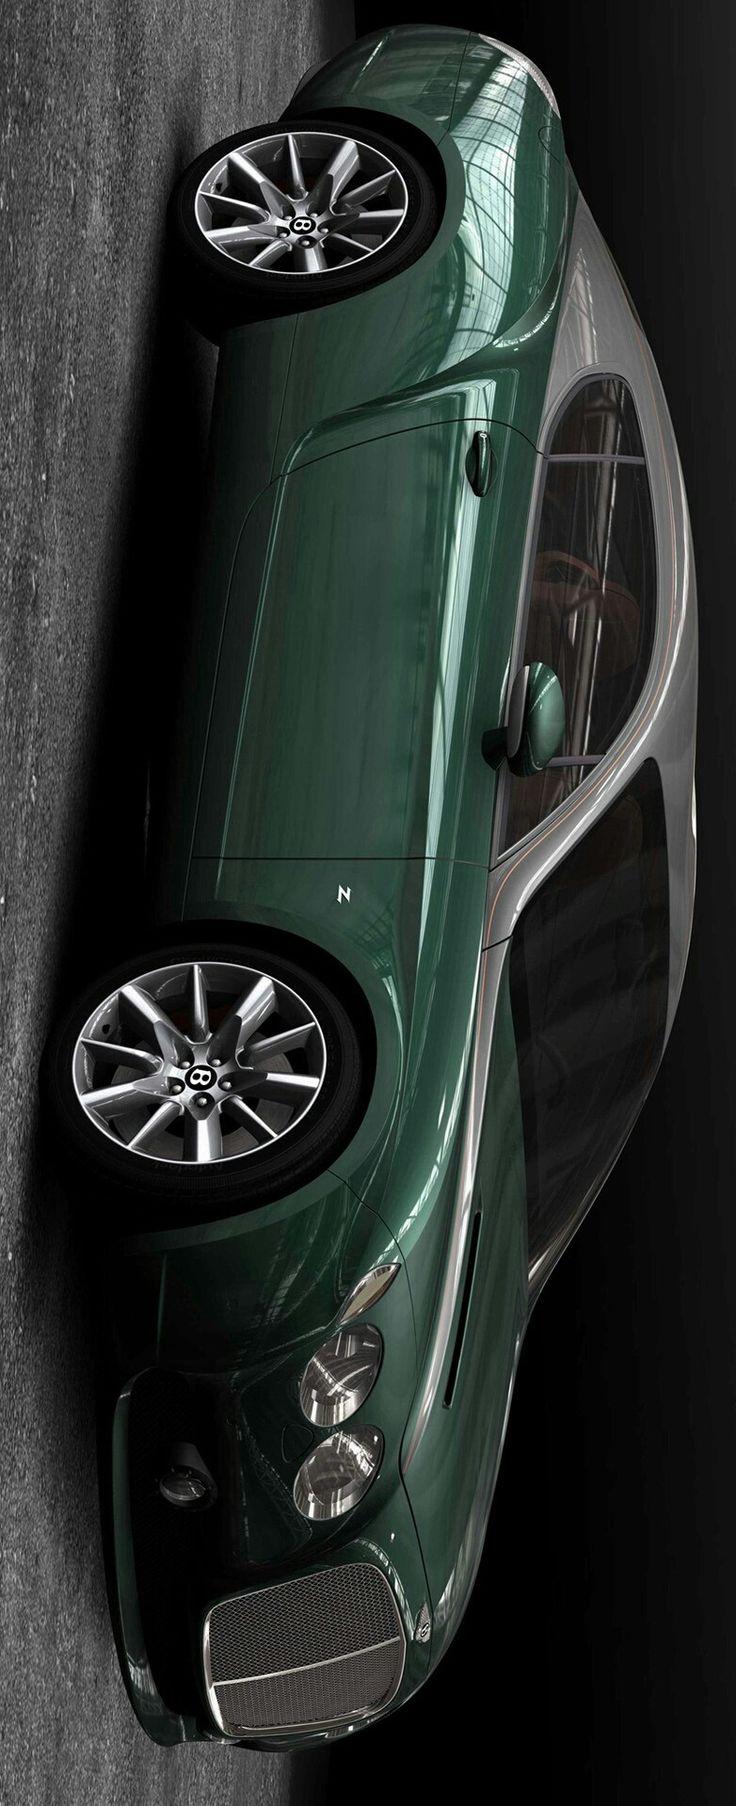 Bentley Zagato GTZ by Levon Travel In Style